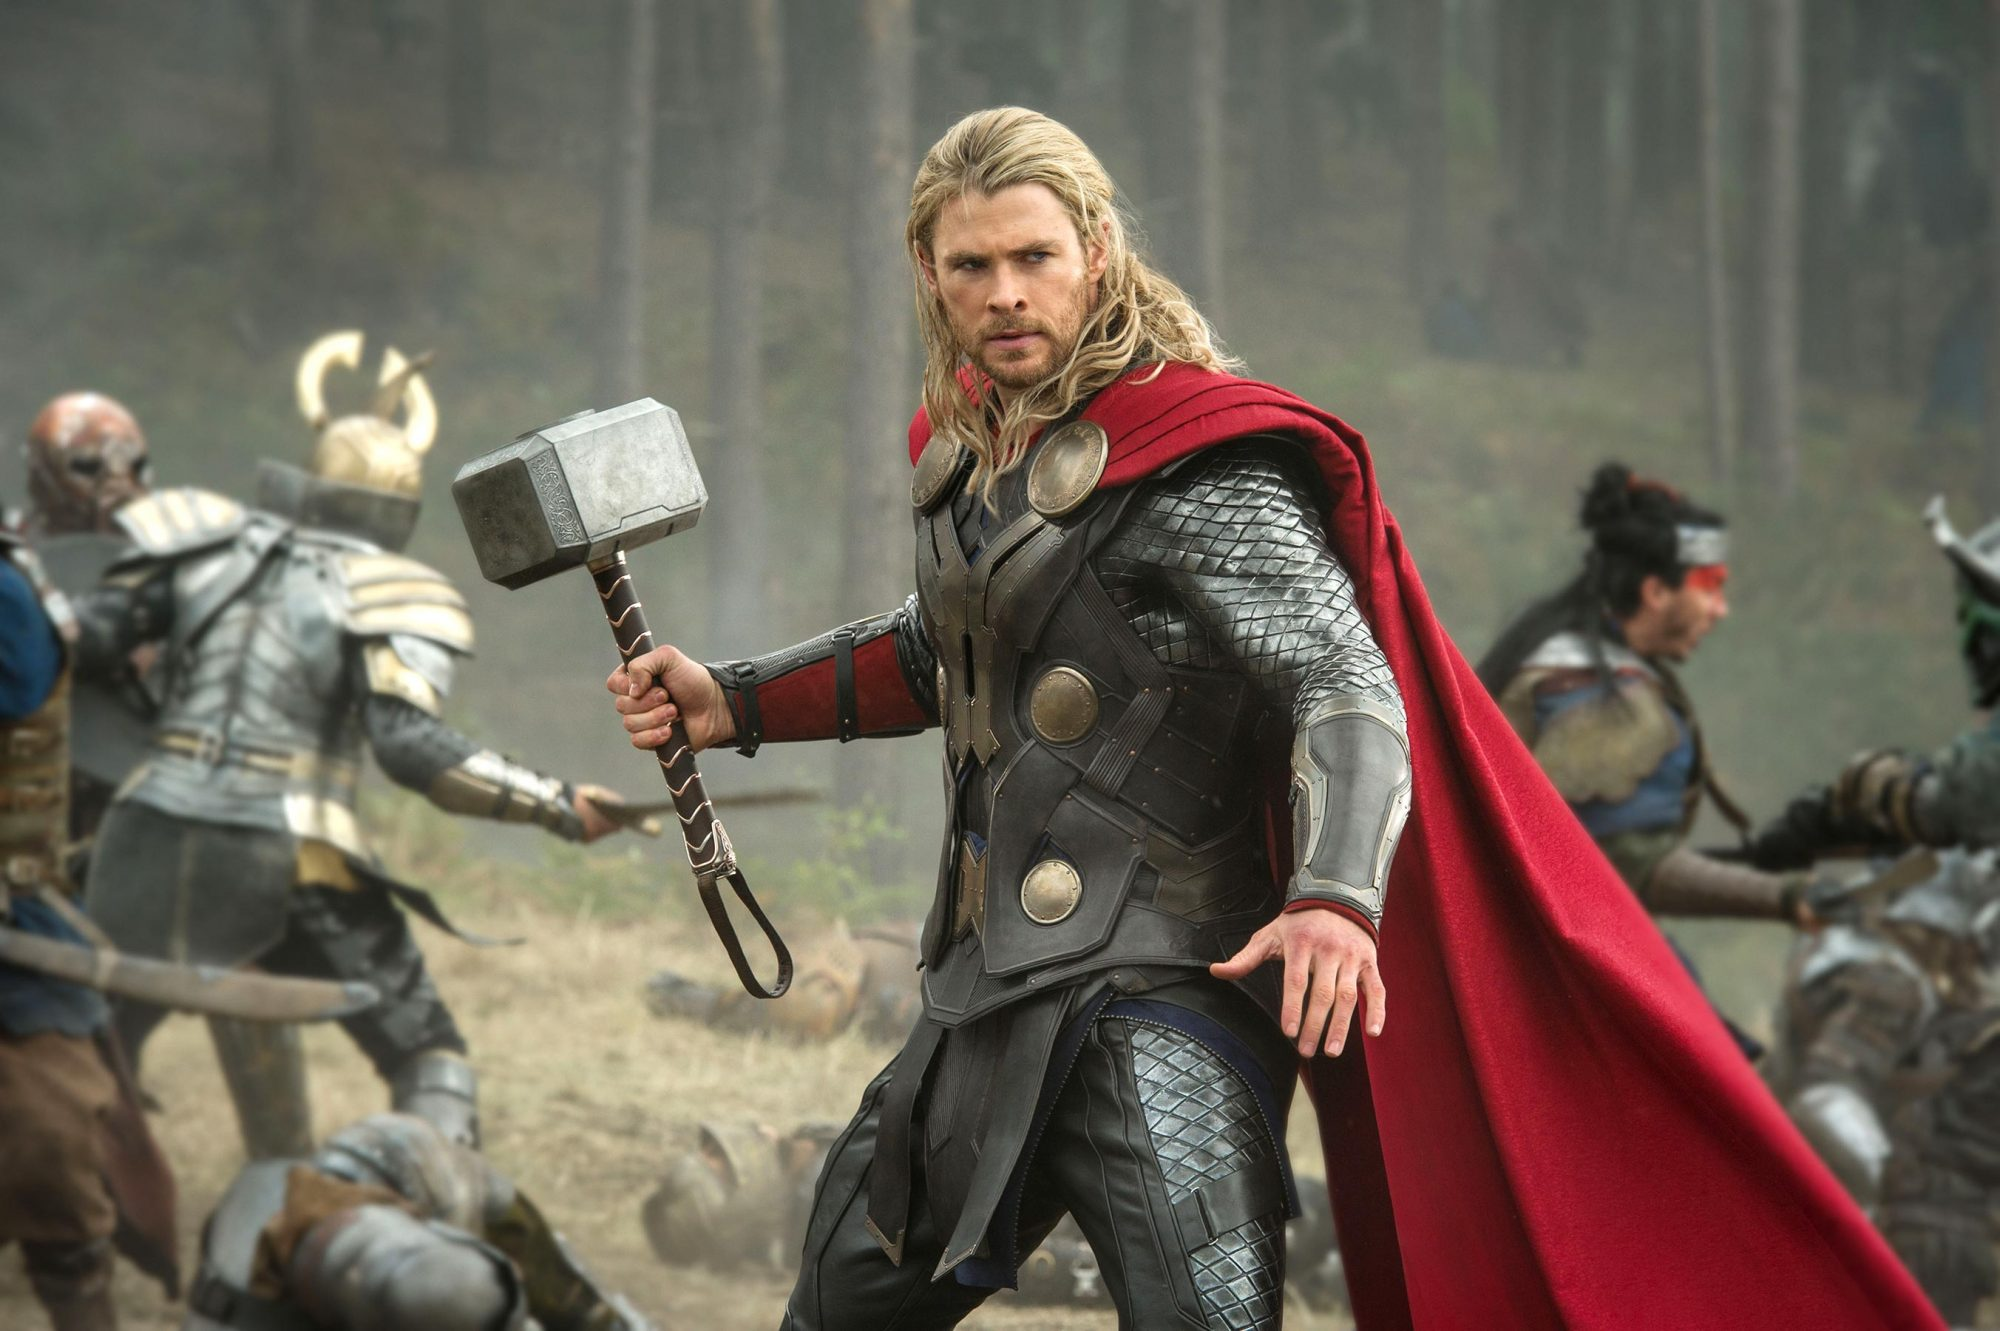 THOR: THE DARK WORLD, Chris Hemsworth as Thor, 2013. ph: Jay Maidment/©Walt Disney Studios/courtesy